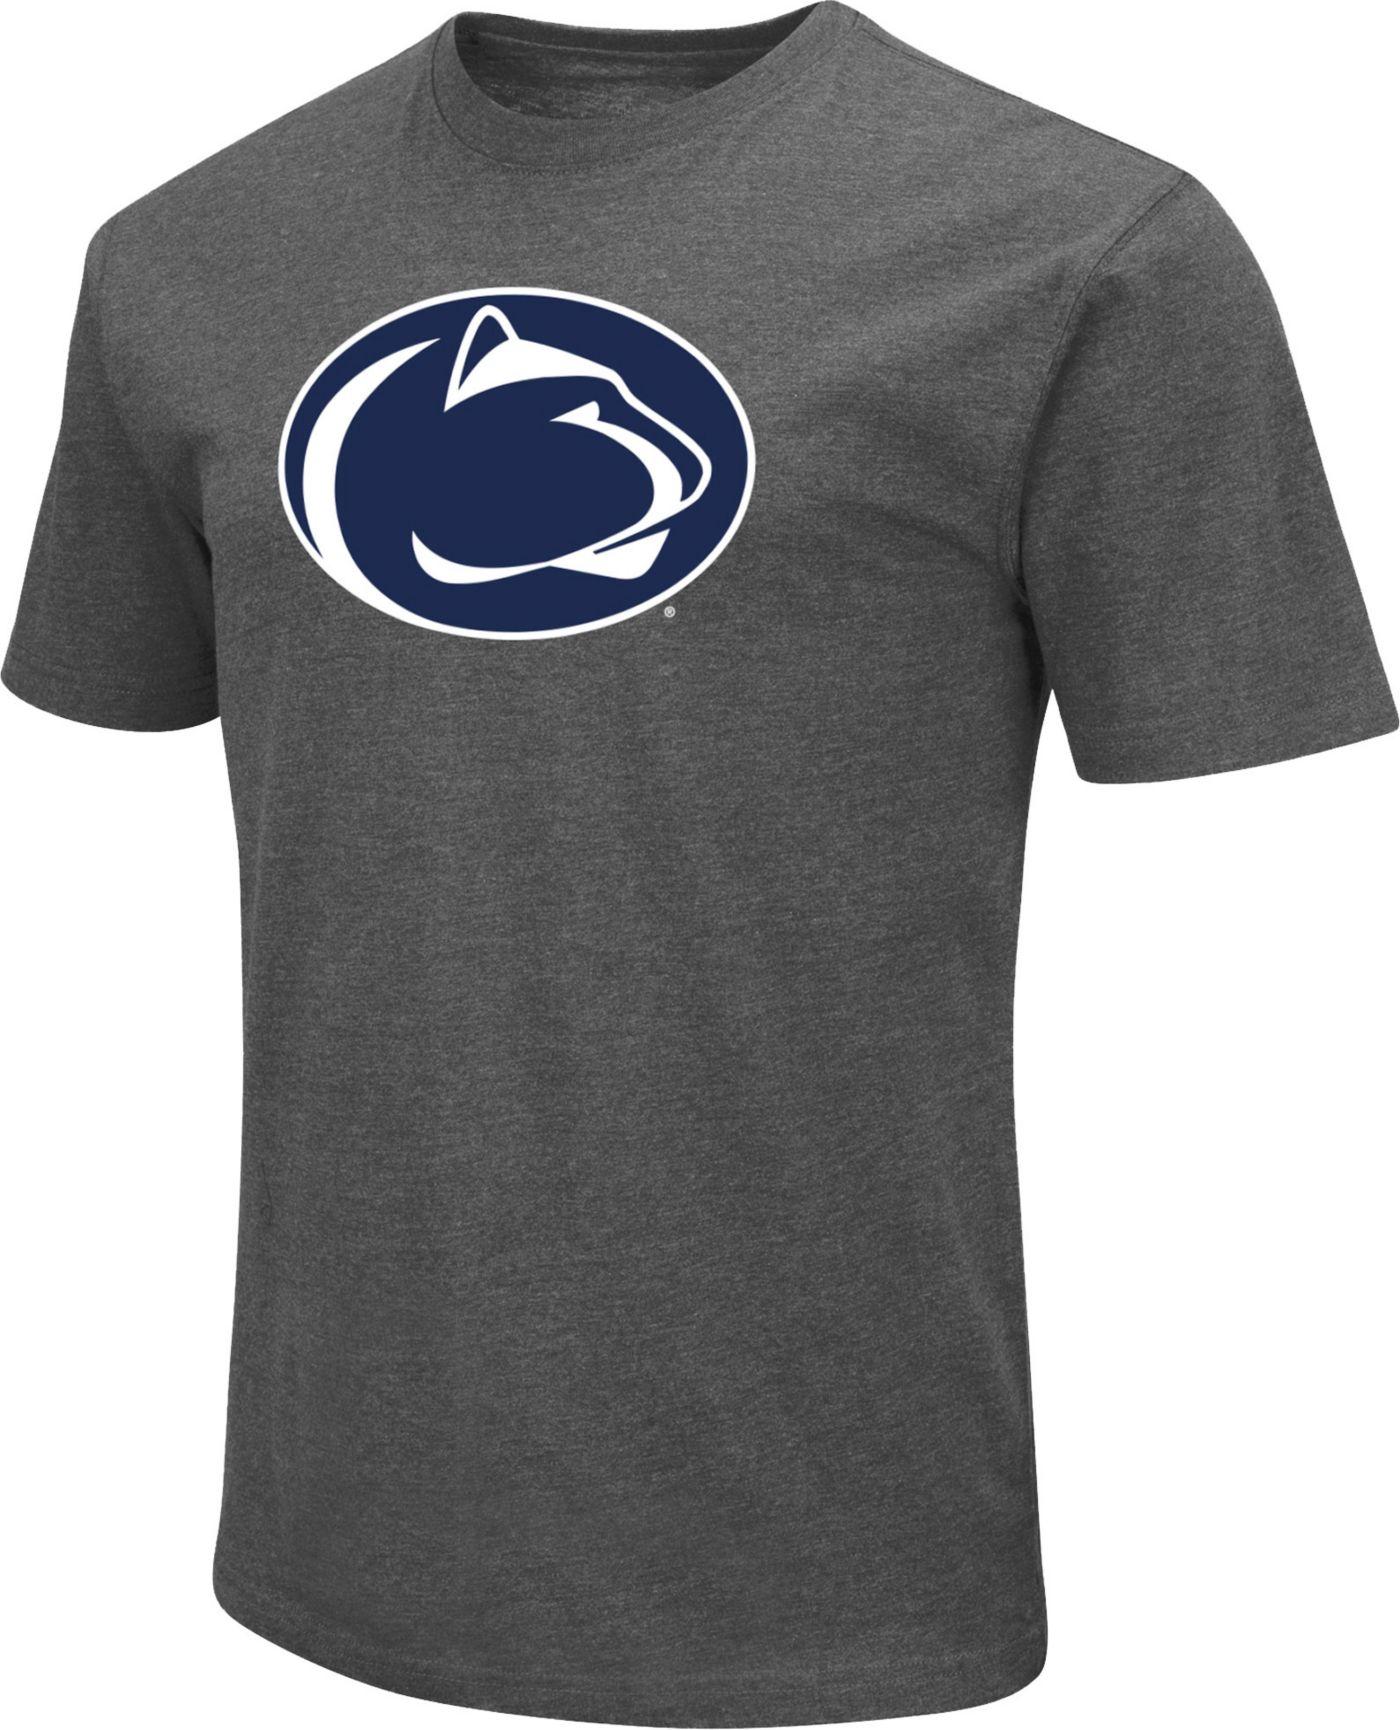 Colosseum Men's Penn State Nittany Lions Grey Dual Blend T-Shirt